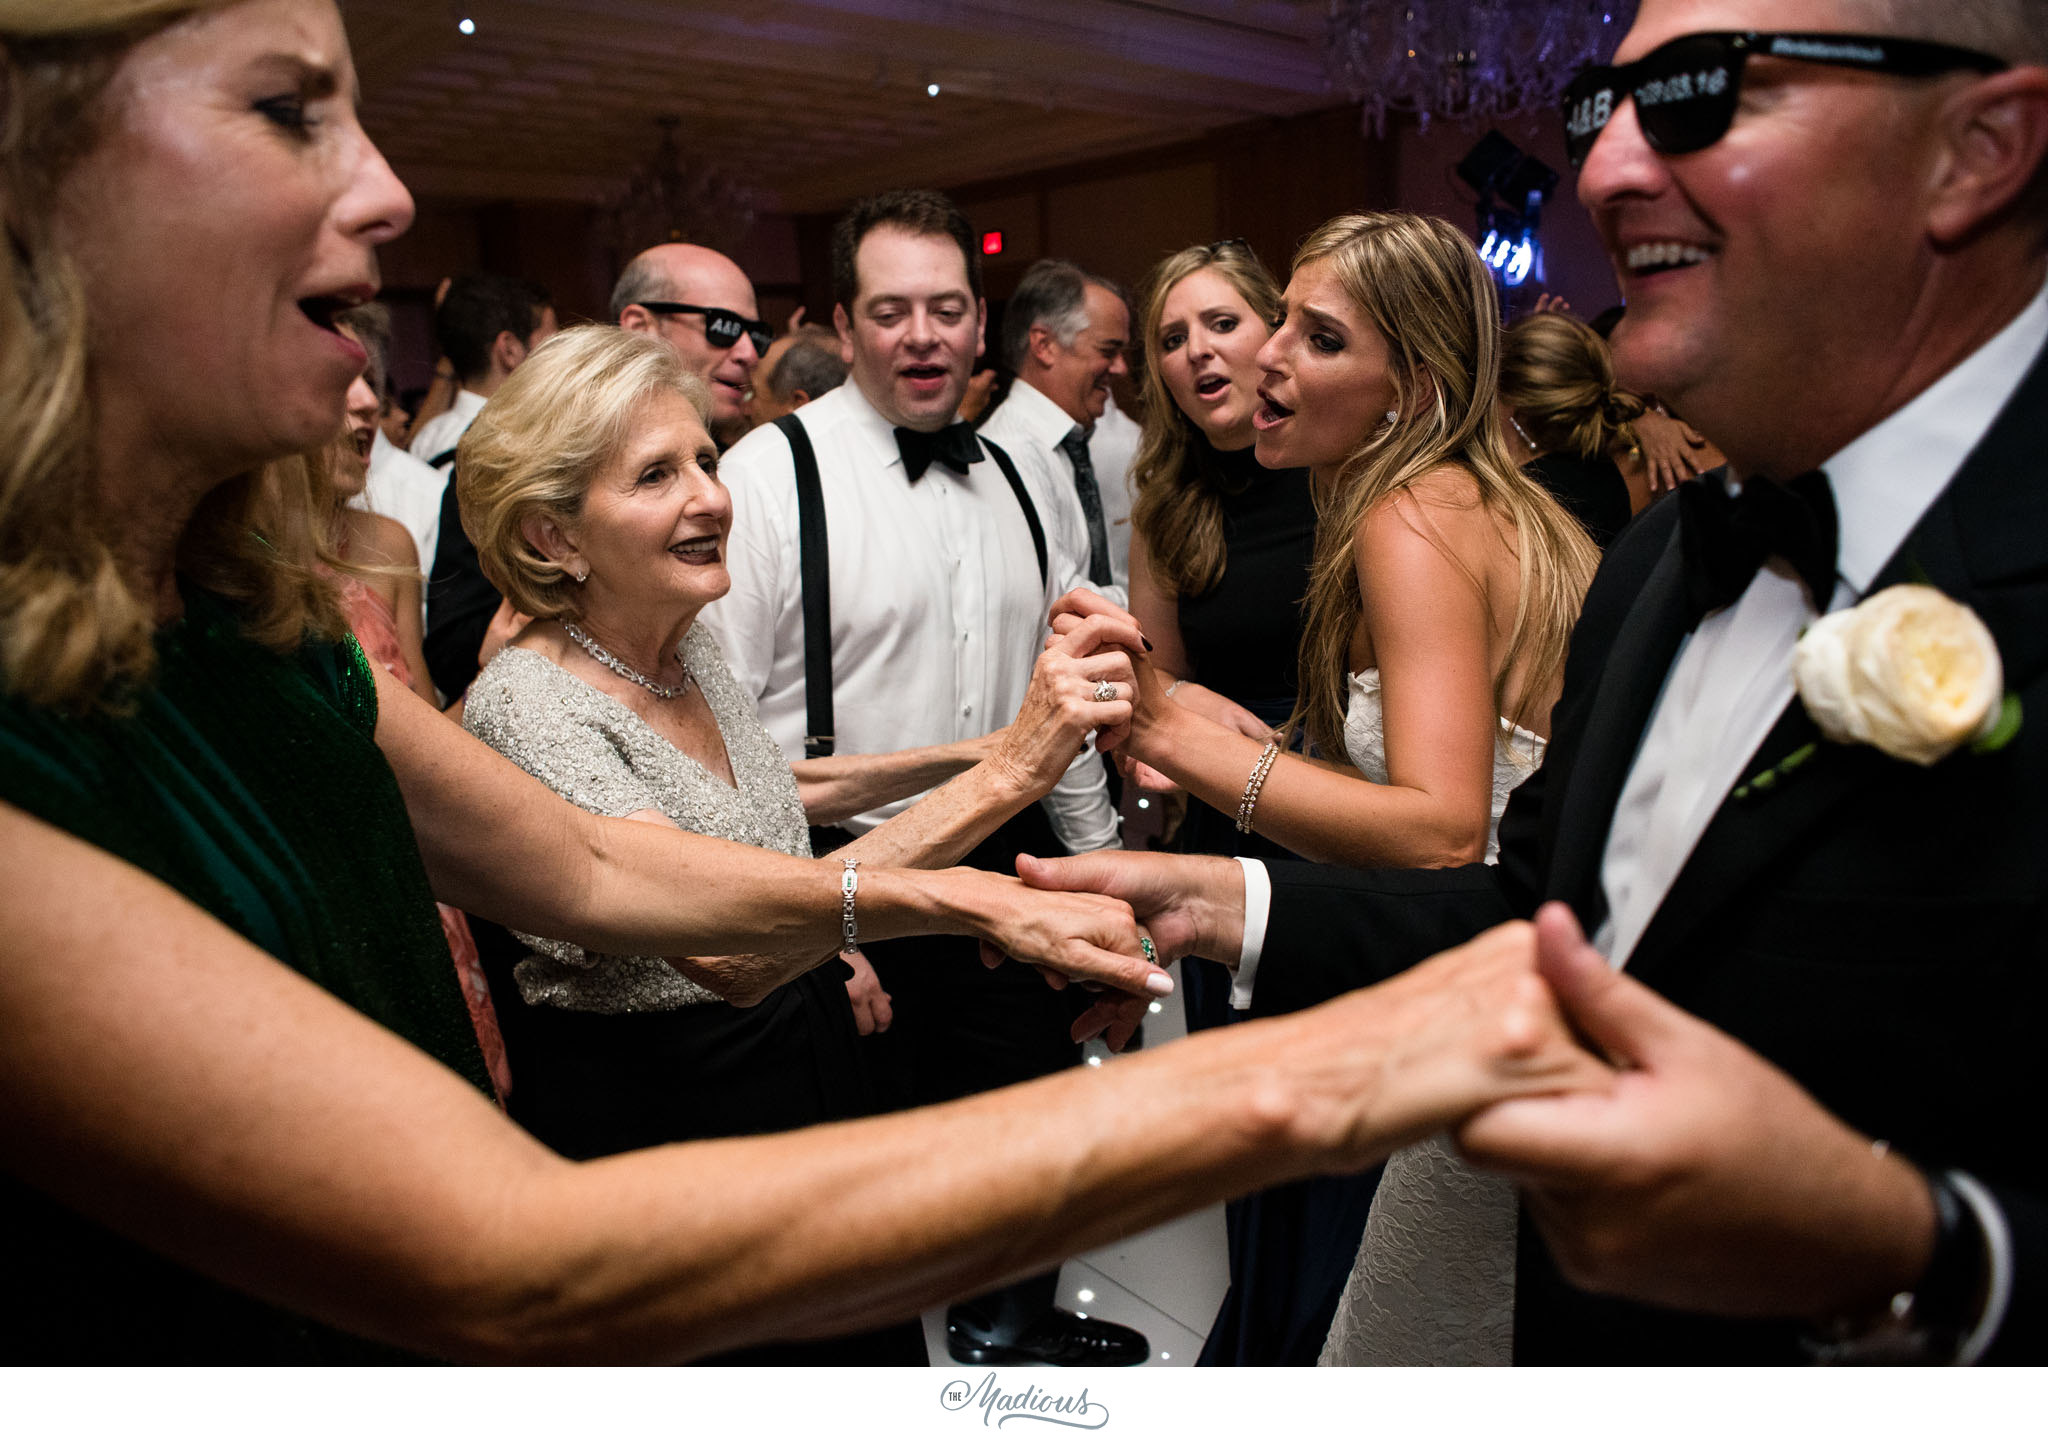 Townsend hotel michigan wedding_58.JPG